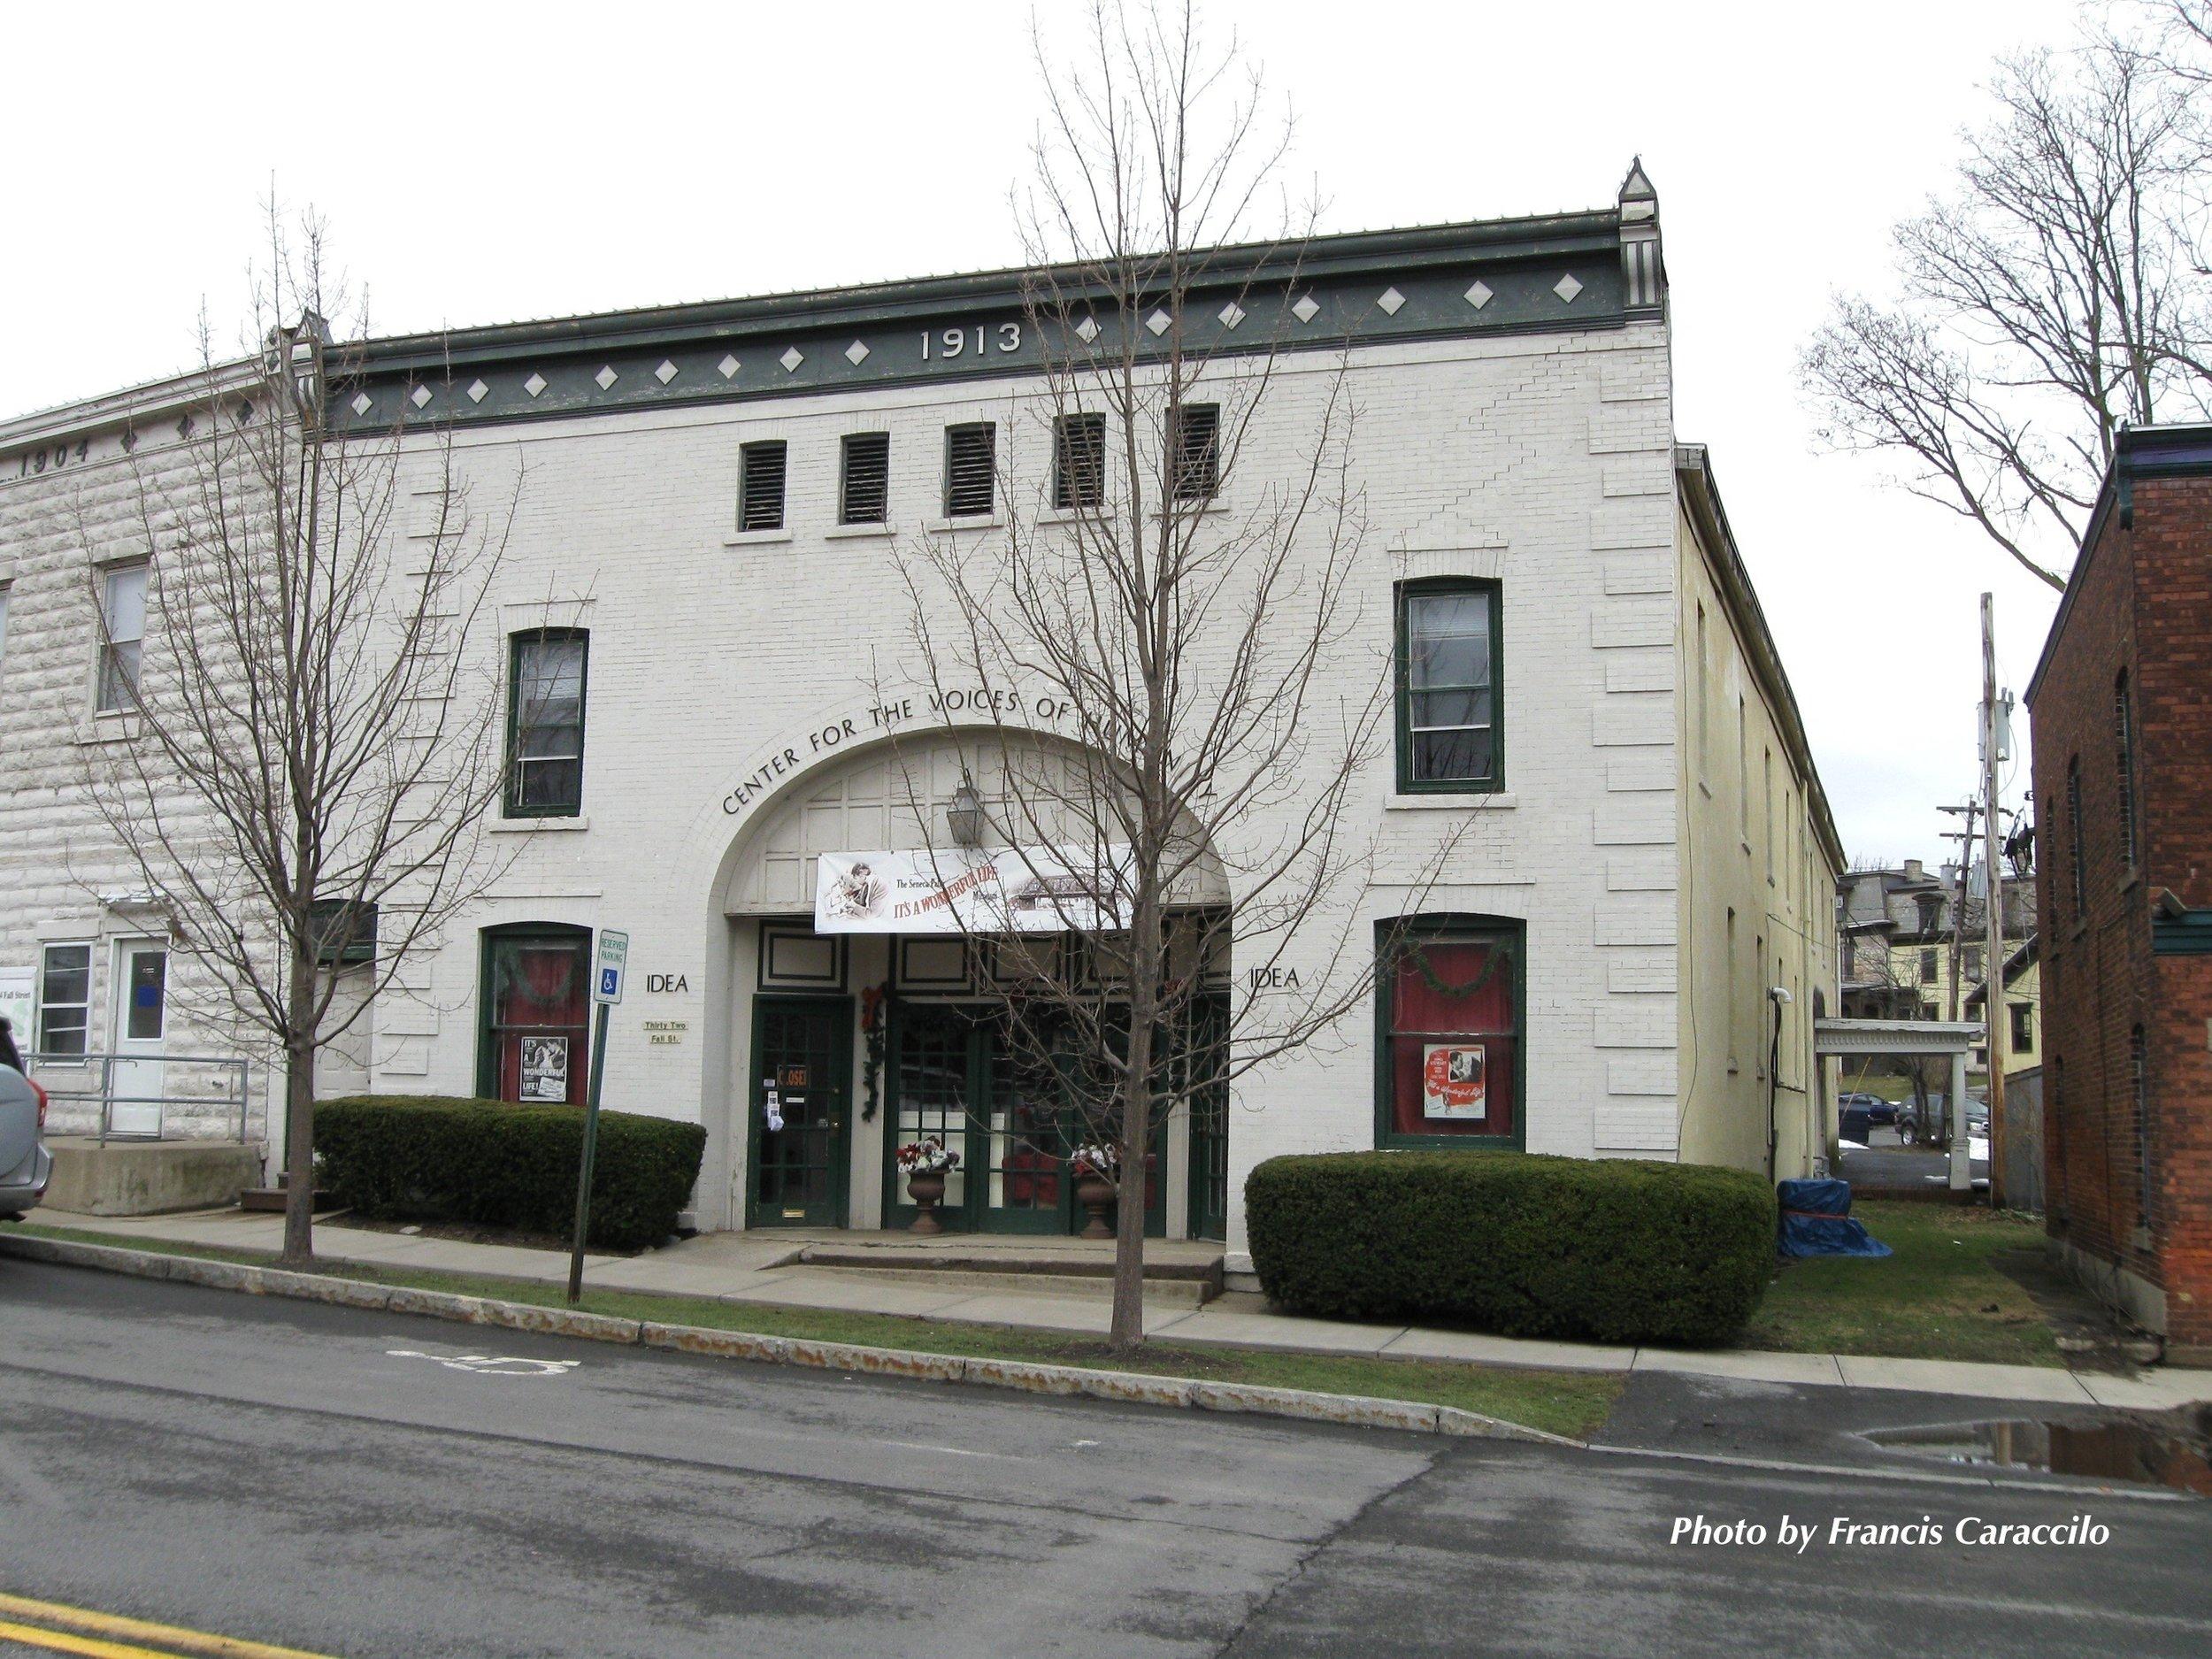 Seneca Falls It's a Wonderful Life Museum & Archives